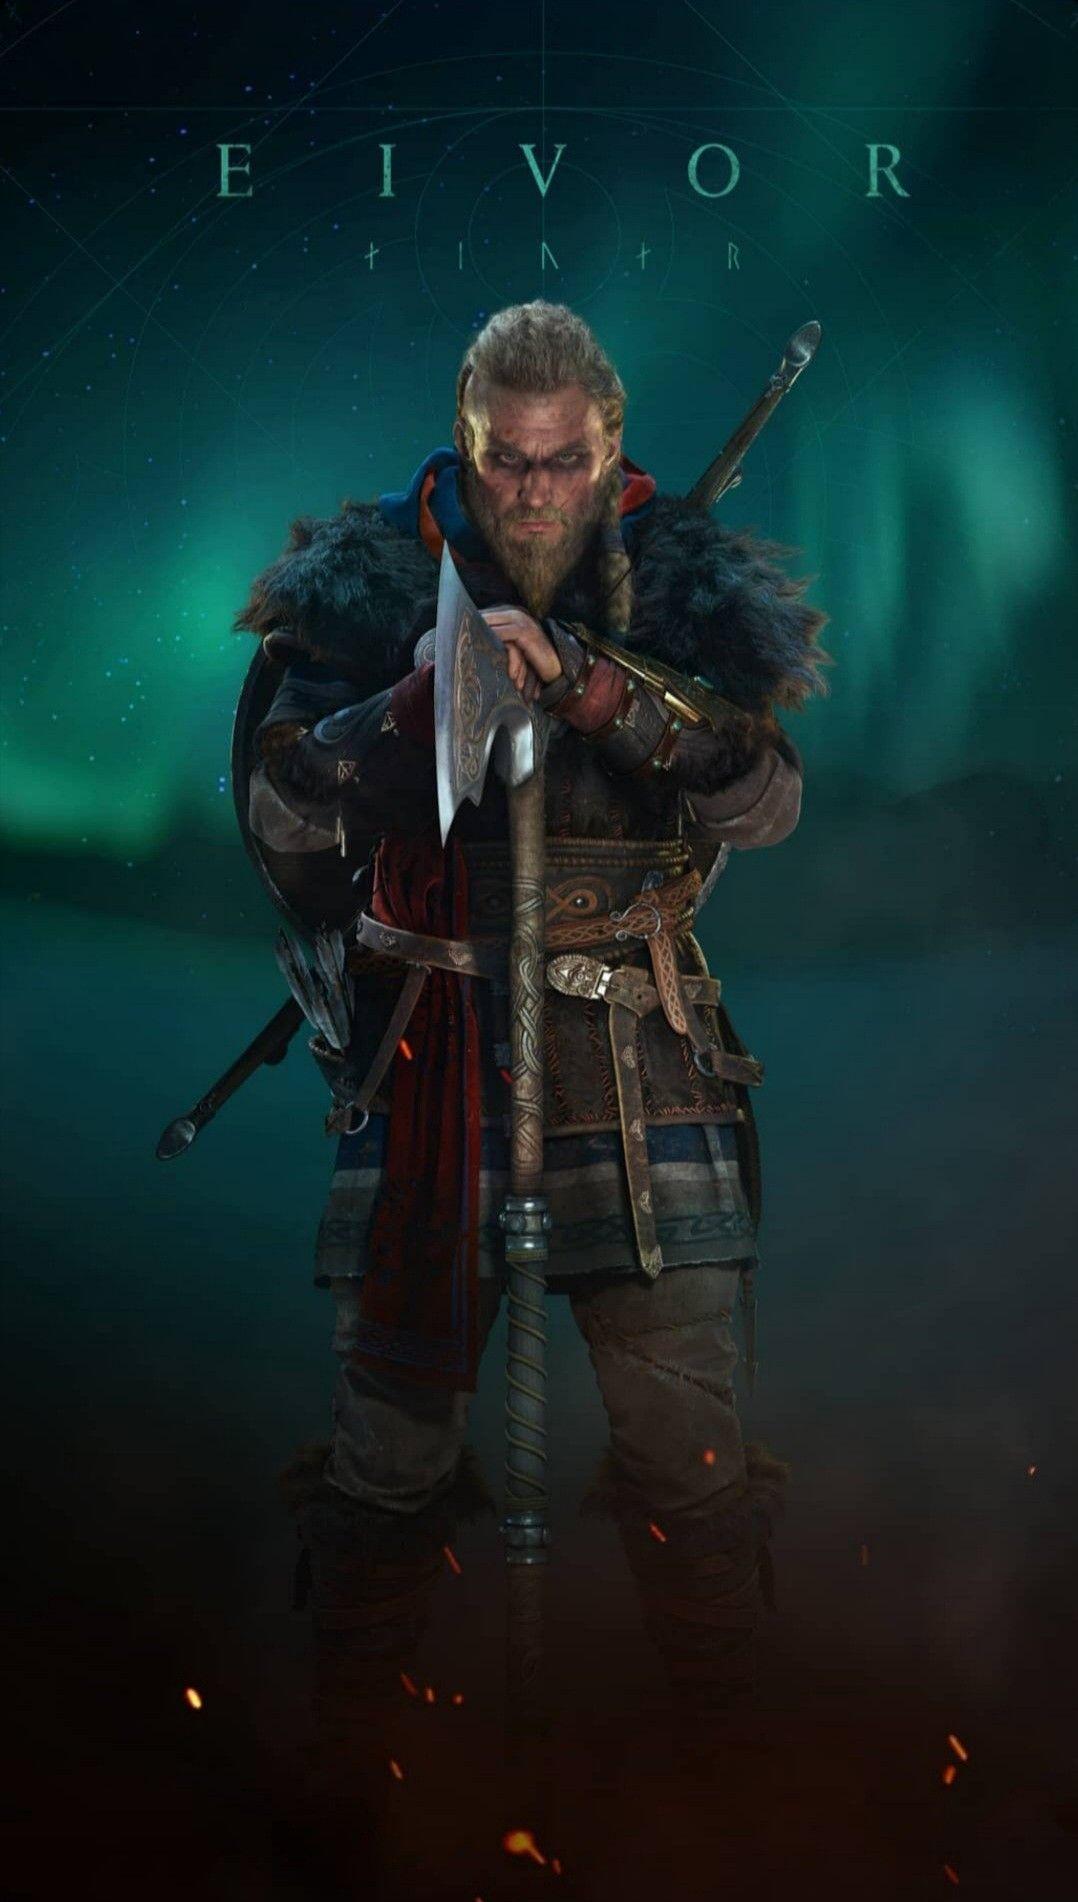 Assassin S Creed Valhalla Eivor In 2020 Assassins Creed Black Flag Assassin S Creed Assasins Creed